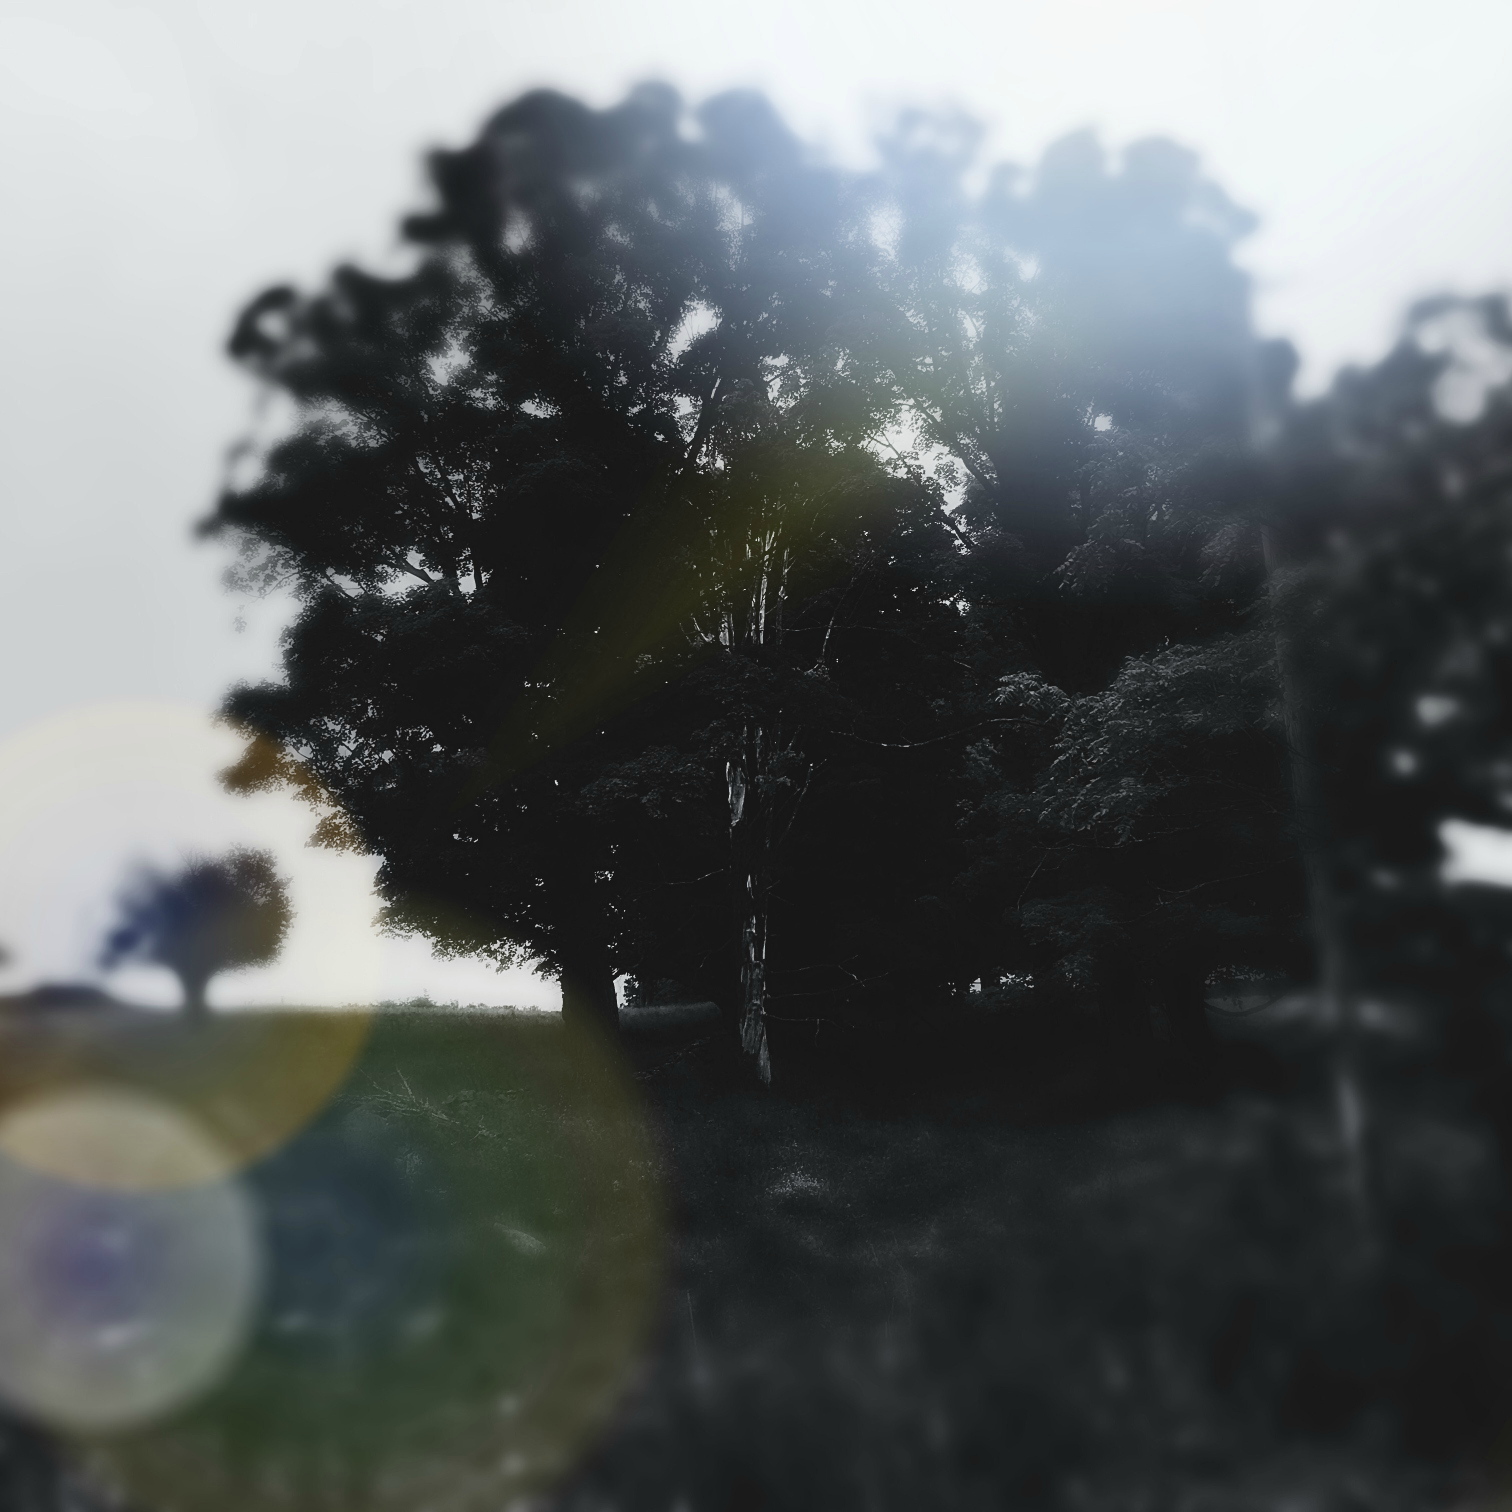 ©Trees At Dawn by Dena T Bray